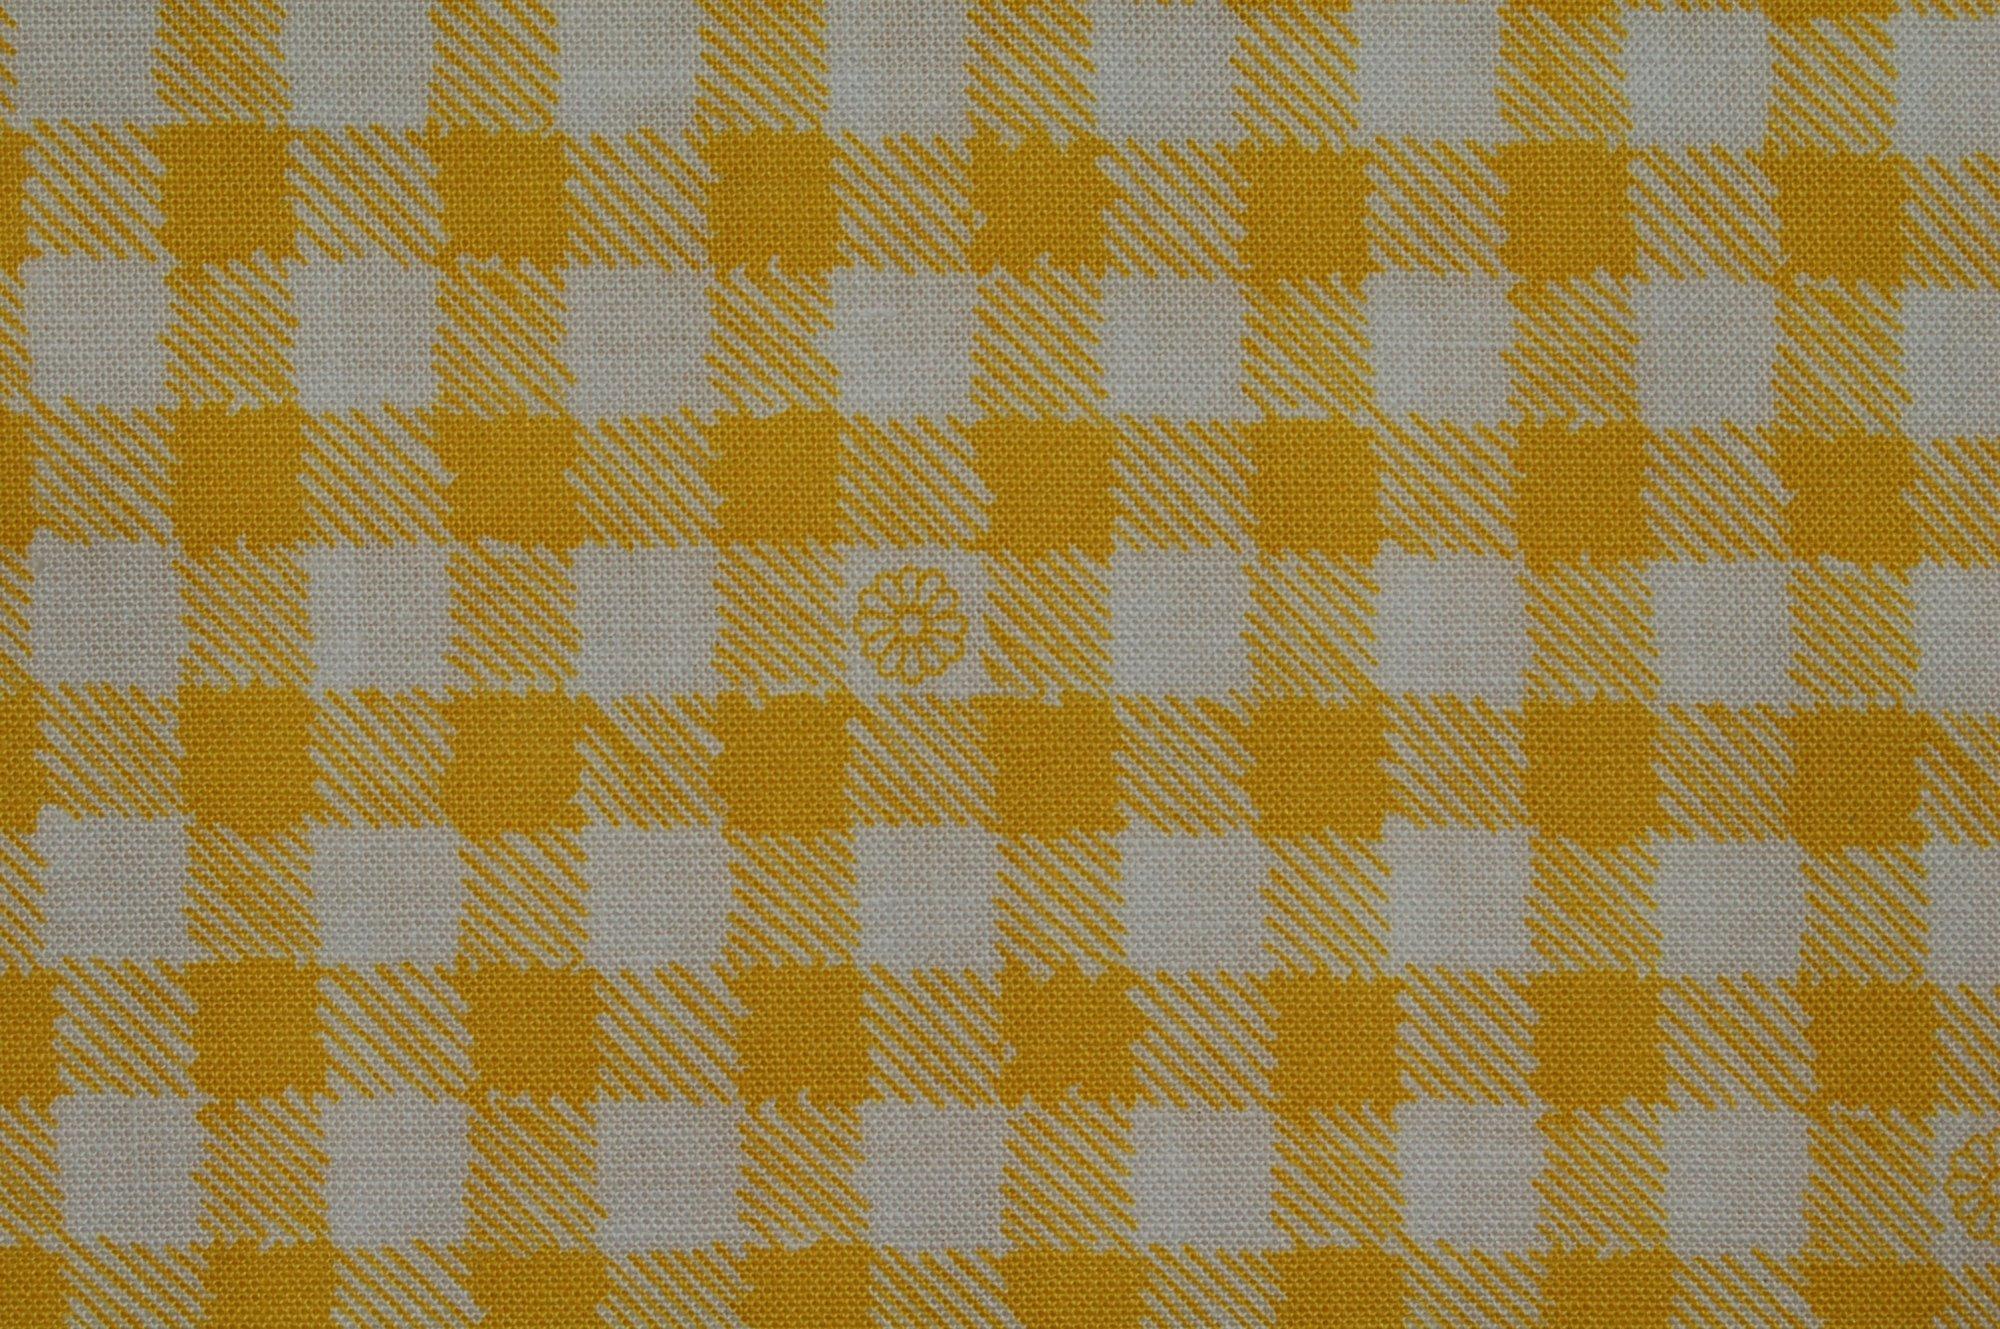 Honey Run Check by Jill Finley for Penny Rose Fabrics